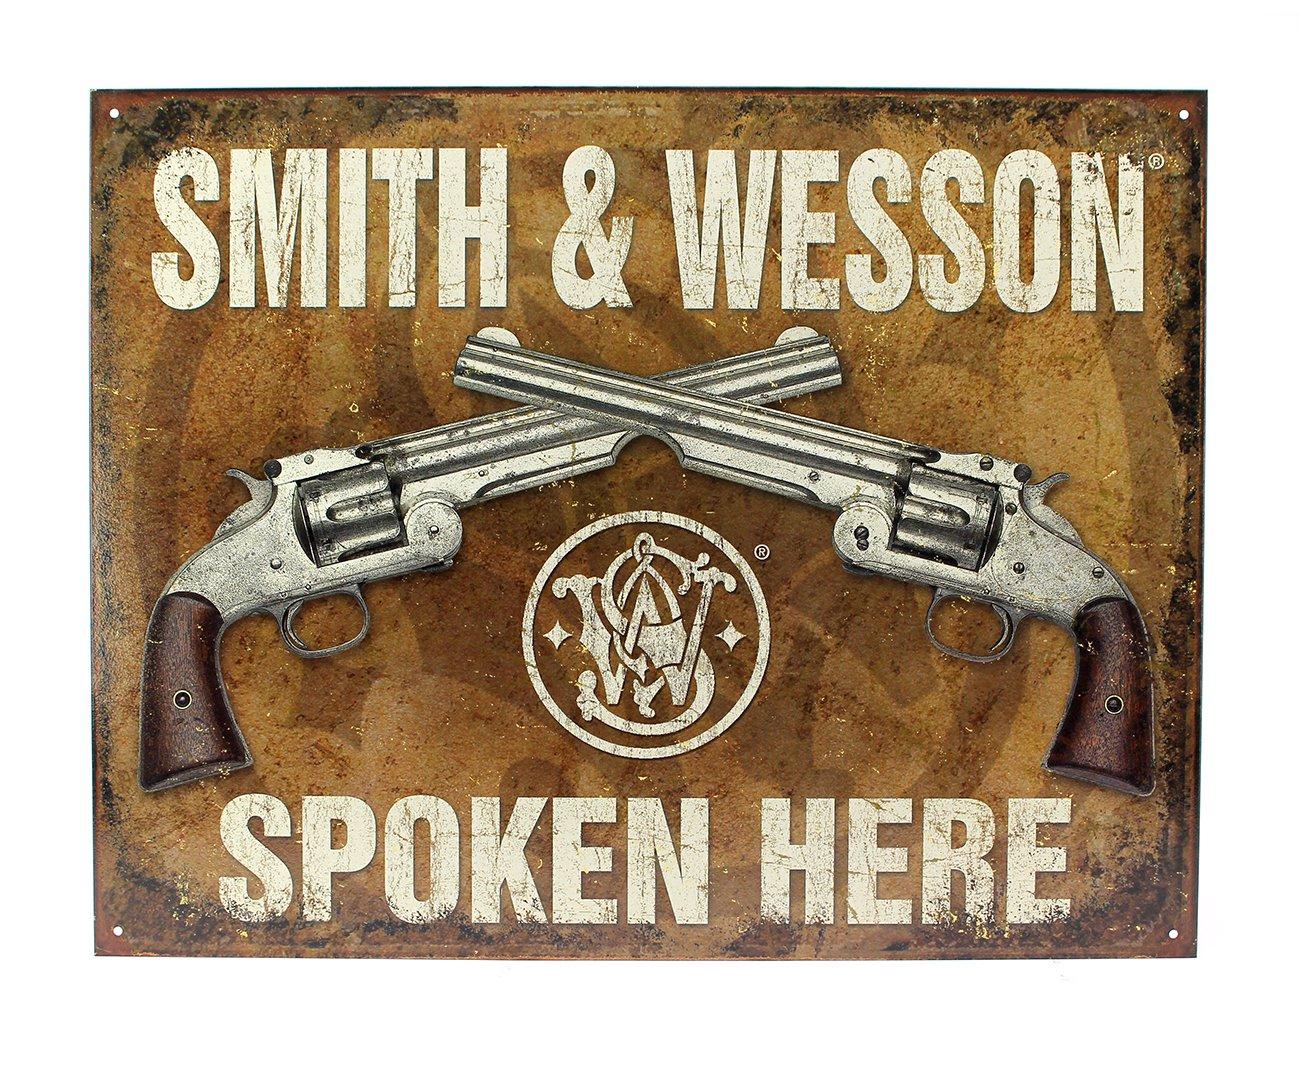 Placa Metálica Decorativa Smith & Wesson Spoken Here - Rossi